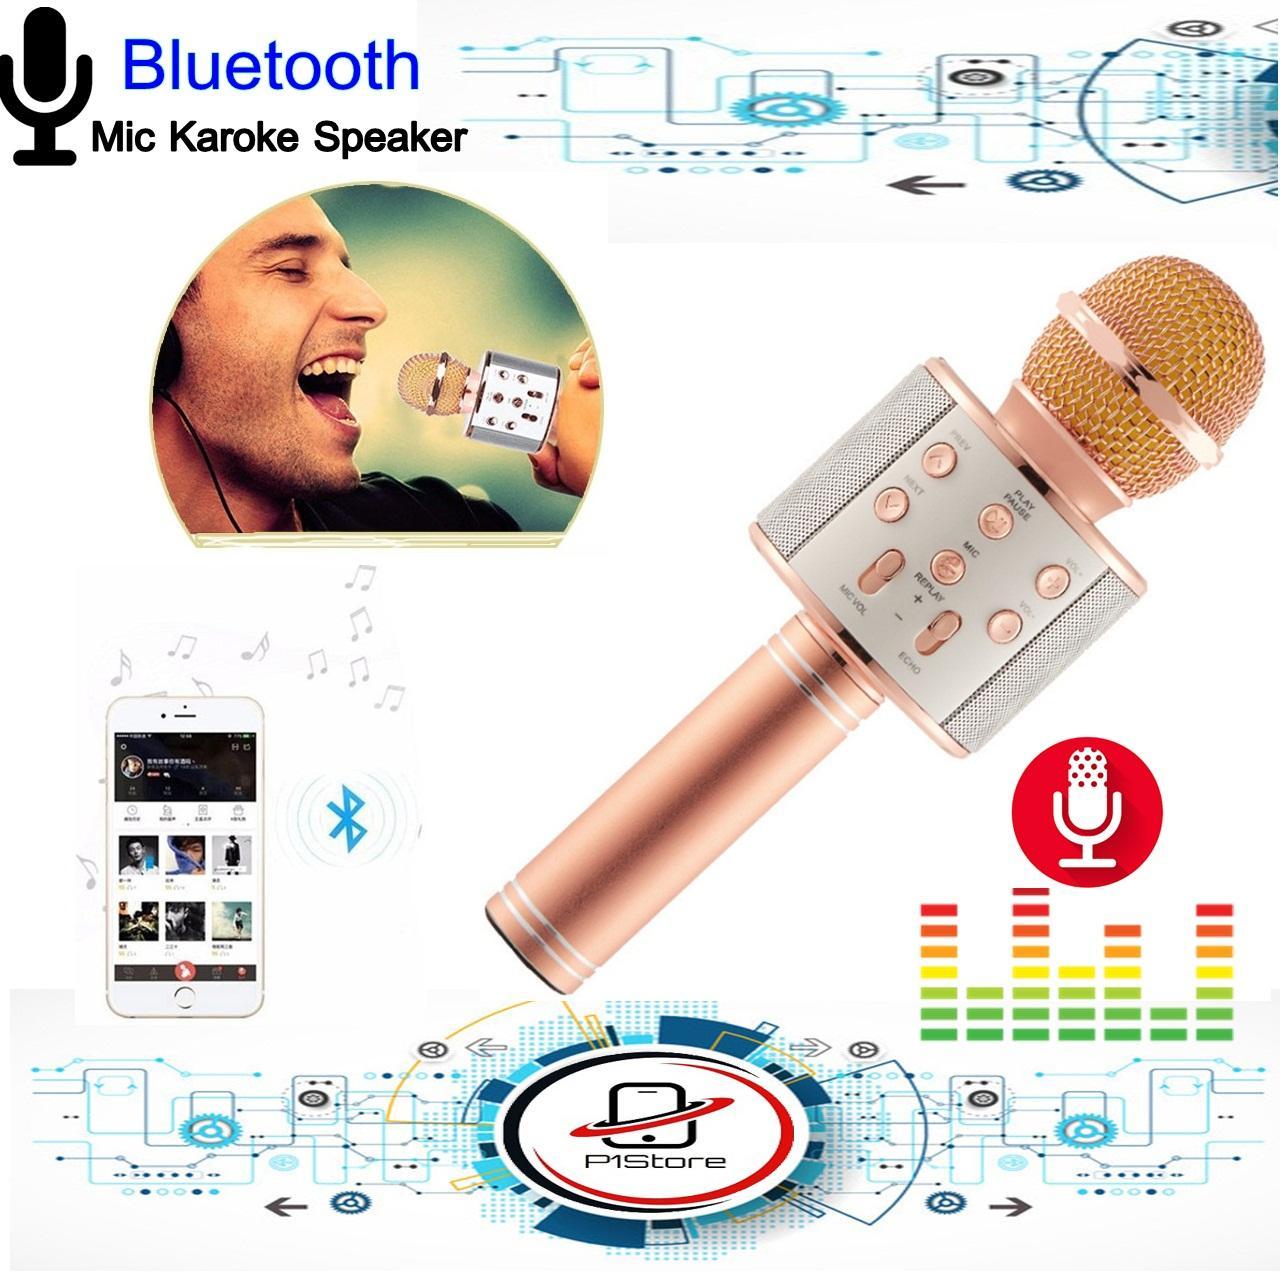 Cek Harga Baru Karsis Magic Mic Karaoke Bluetooth Smule Bigo E103 Wster Ws 858 Original Speaker